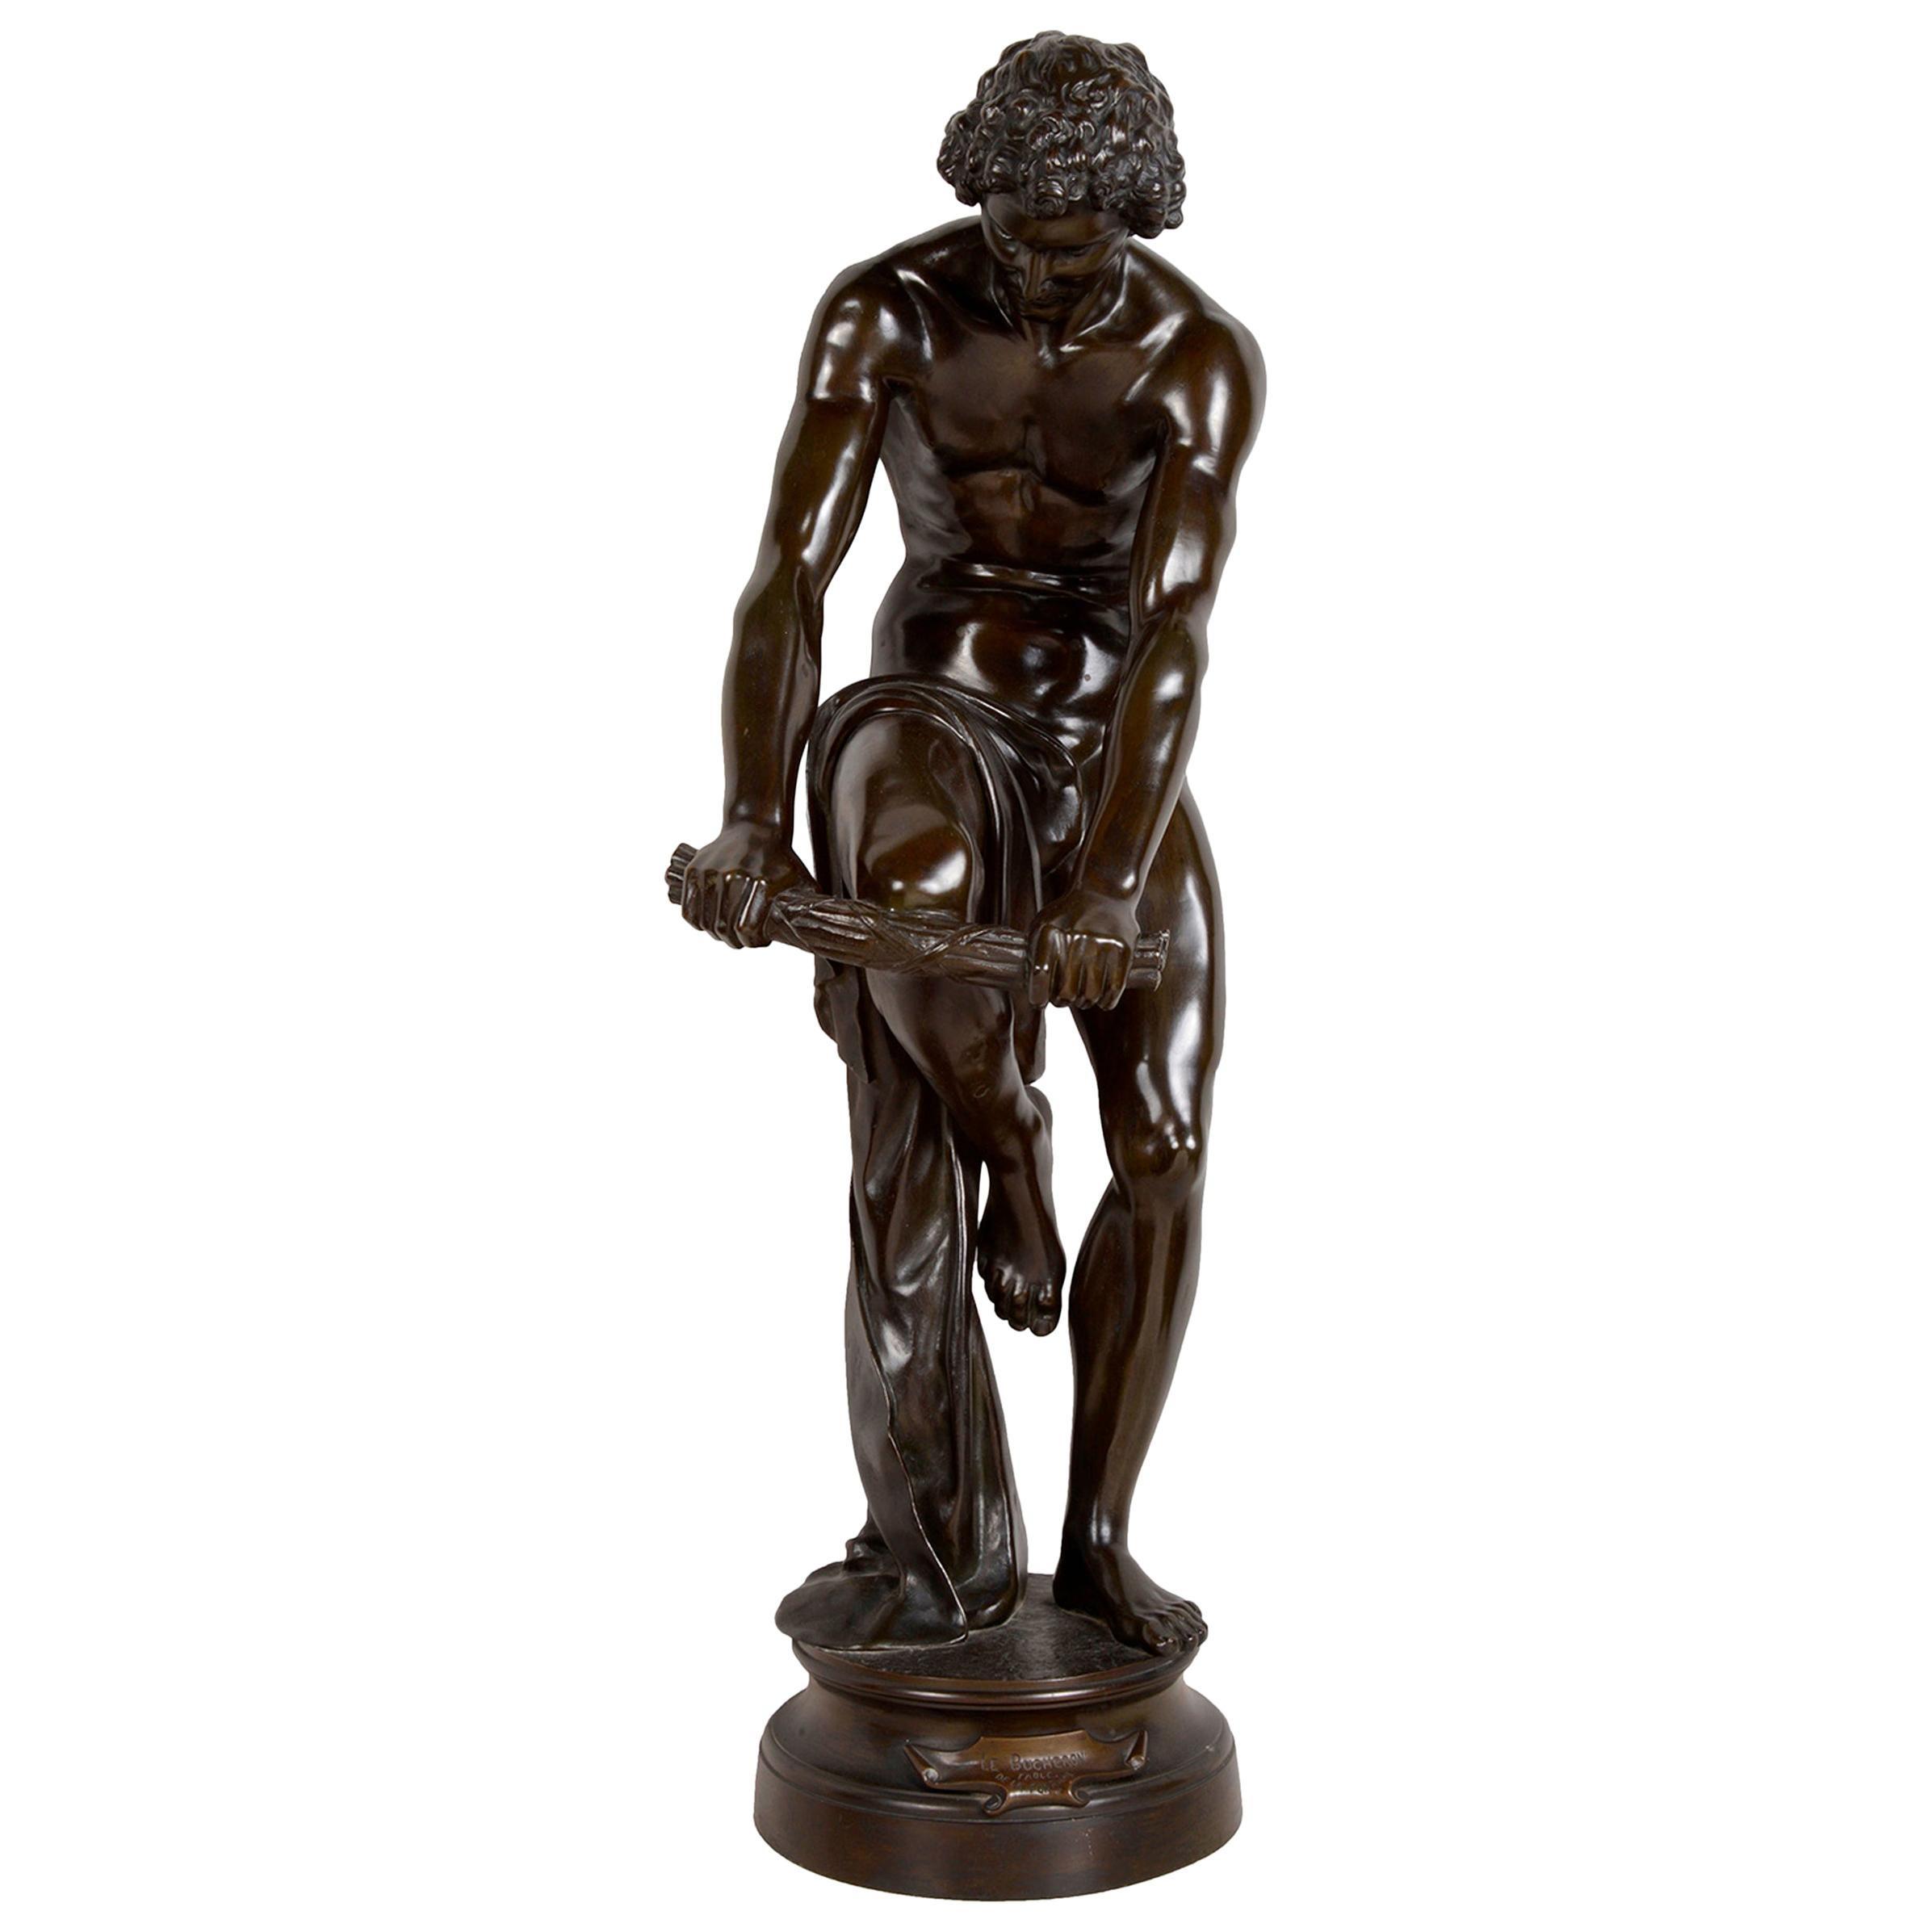 Classical Bronze Statue of a Man Woodsman